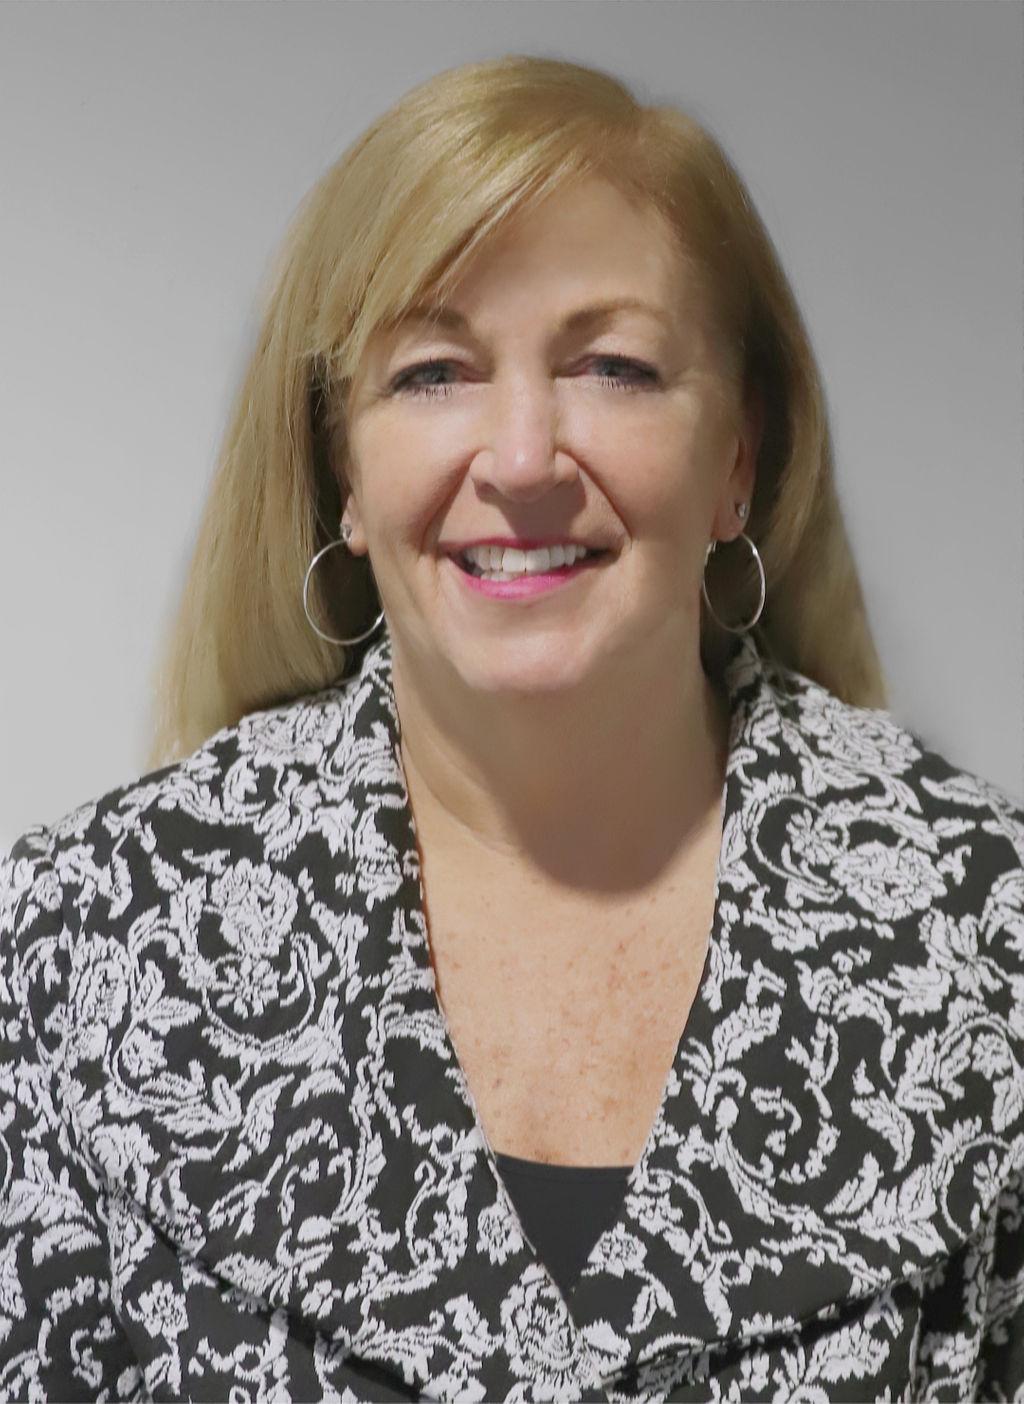 Carol Proctor